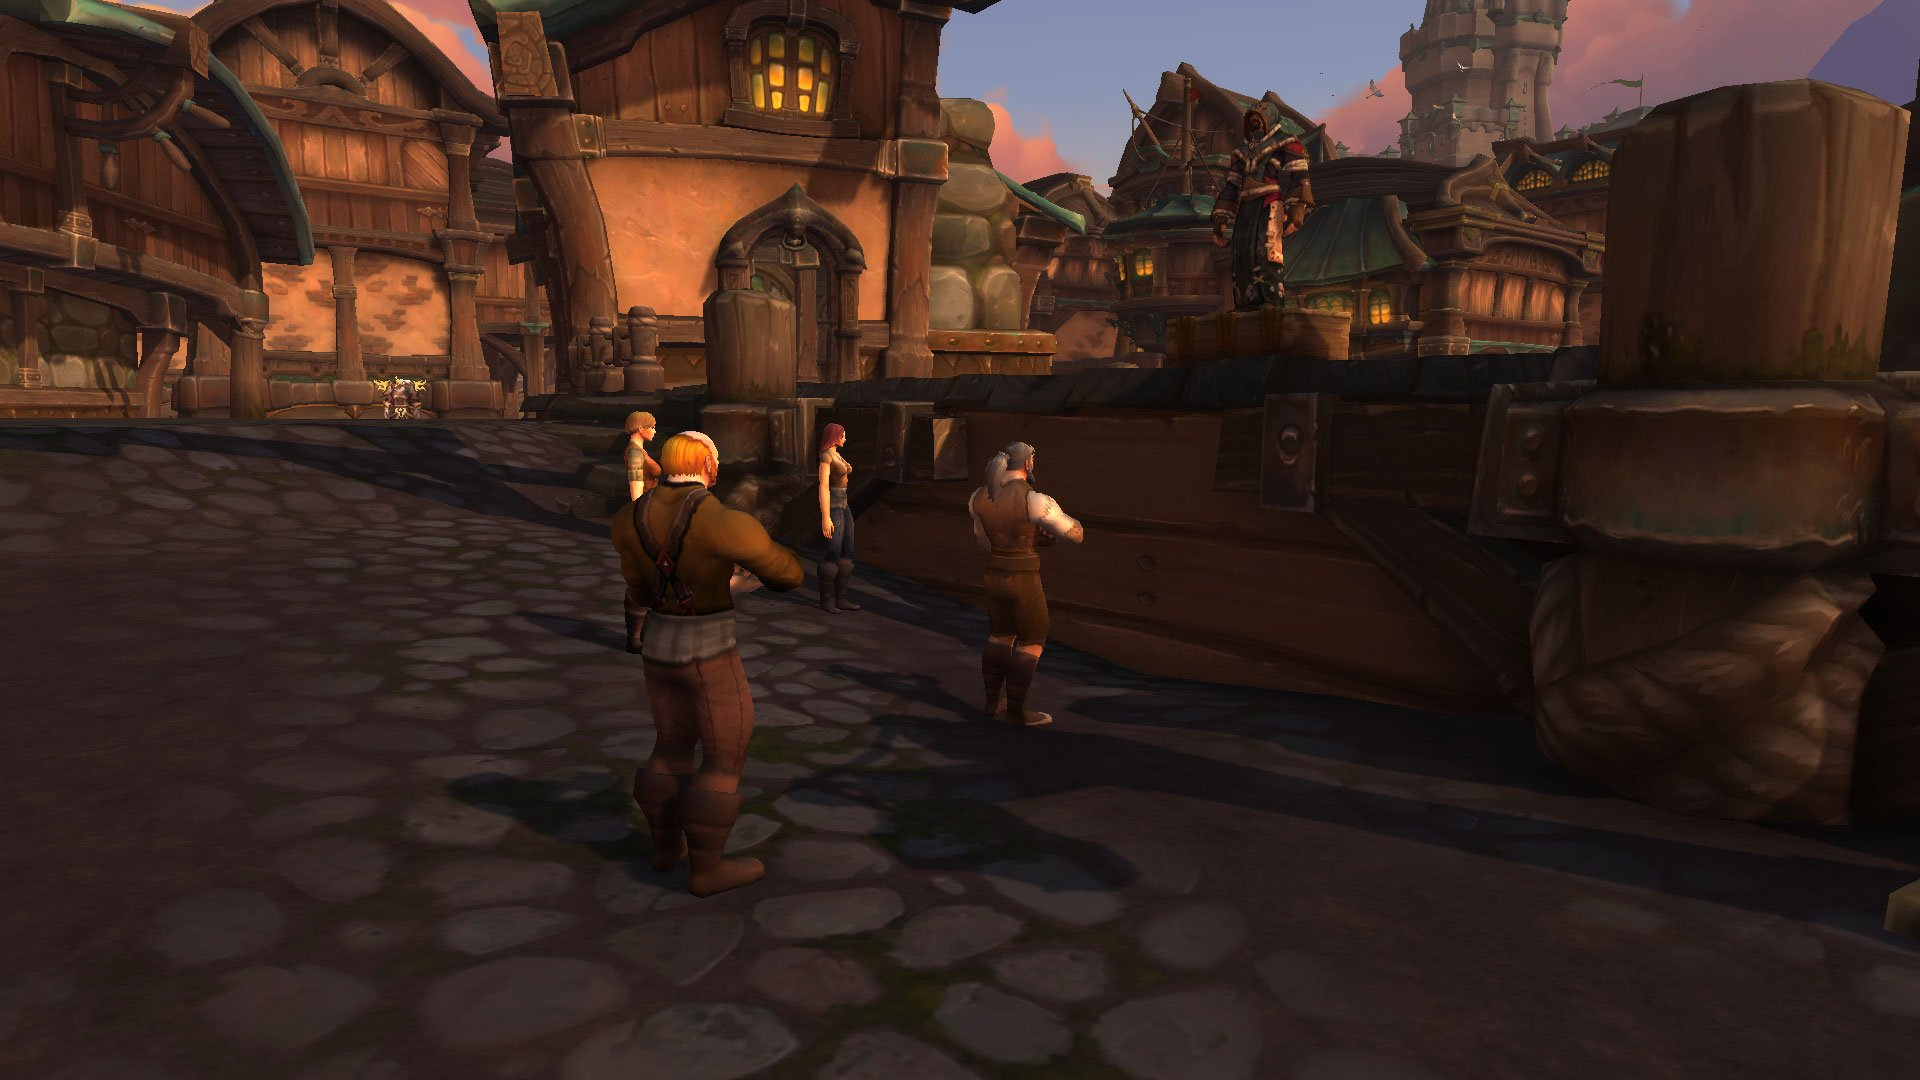 Battle for Azeroth - Boralus Updates, BfA Profession Leveling, Blue Posts, BfA Hunter